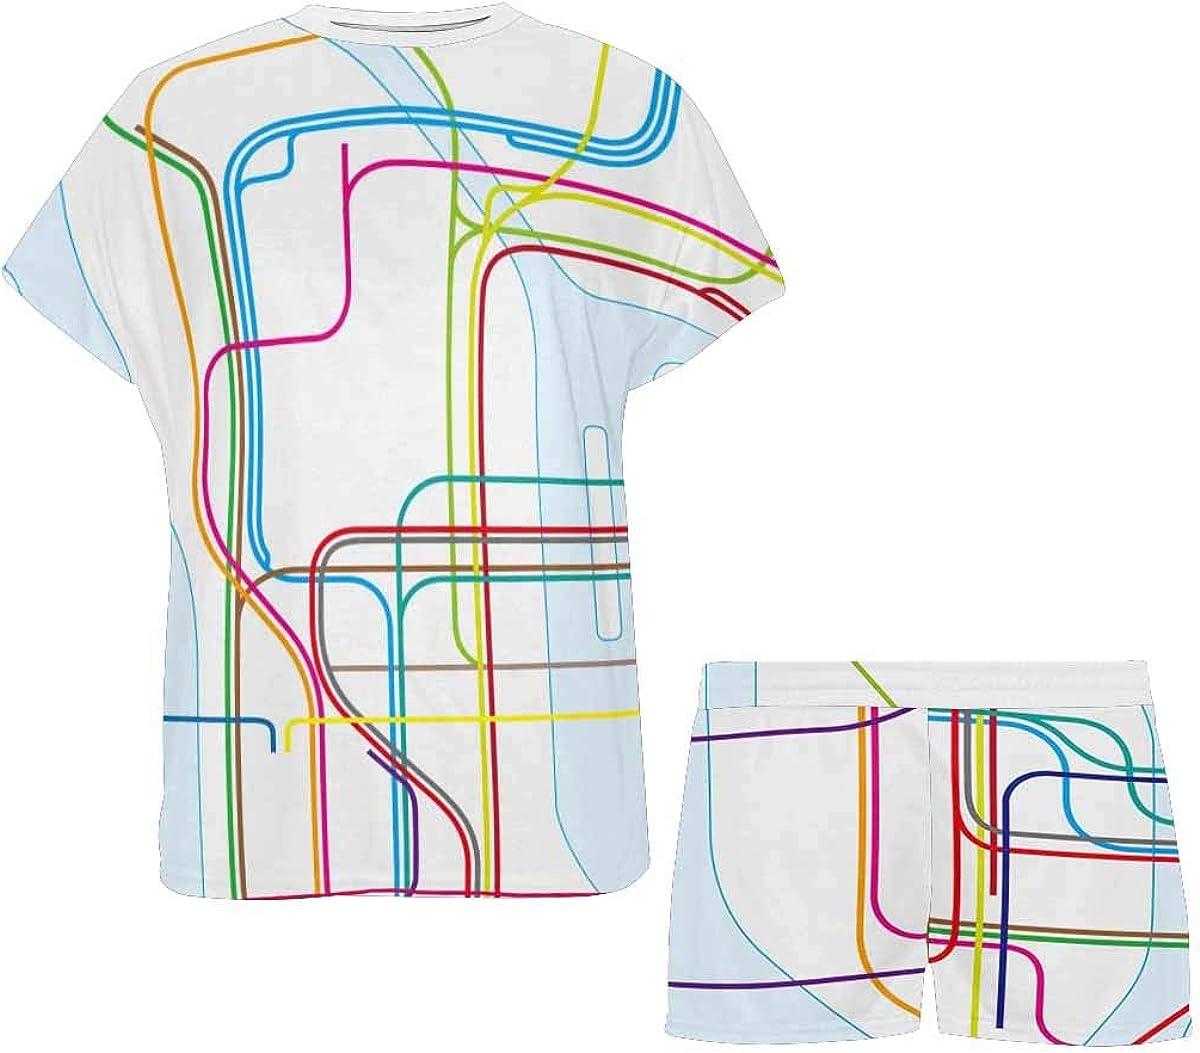 InterestPrint Colored Subway Map Women's Short Sleeve Breathable Sleepwear Two Piece Pajama Set